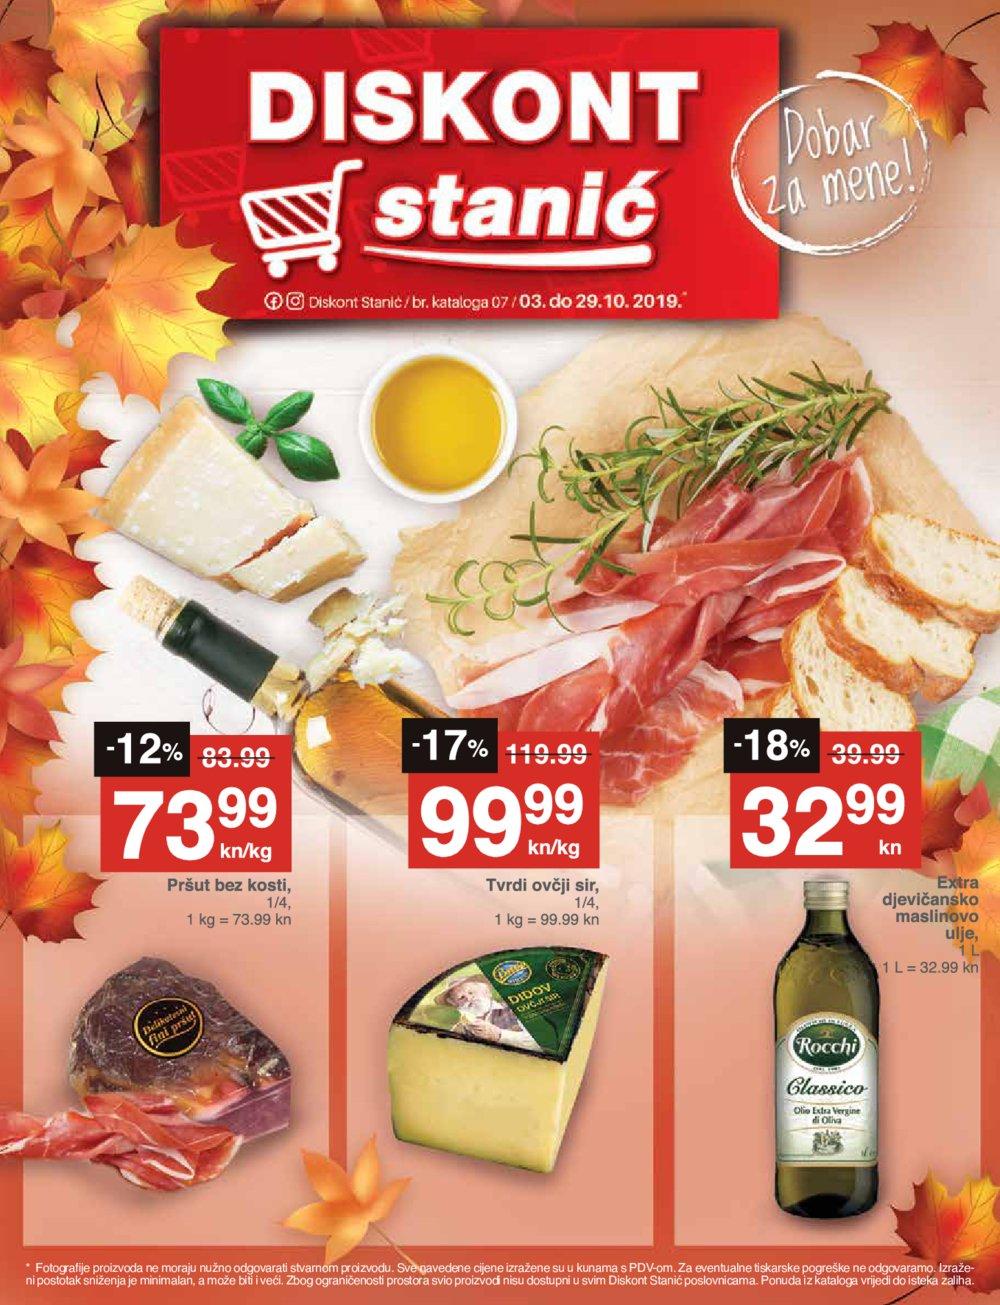 Diskont Stanić katalog Akcija 03.10.-29.10.2019.